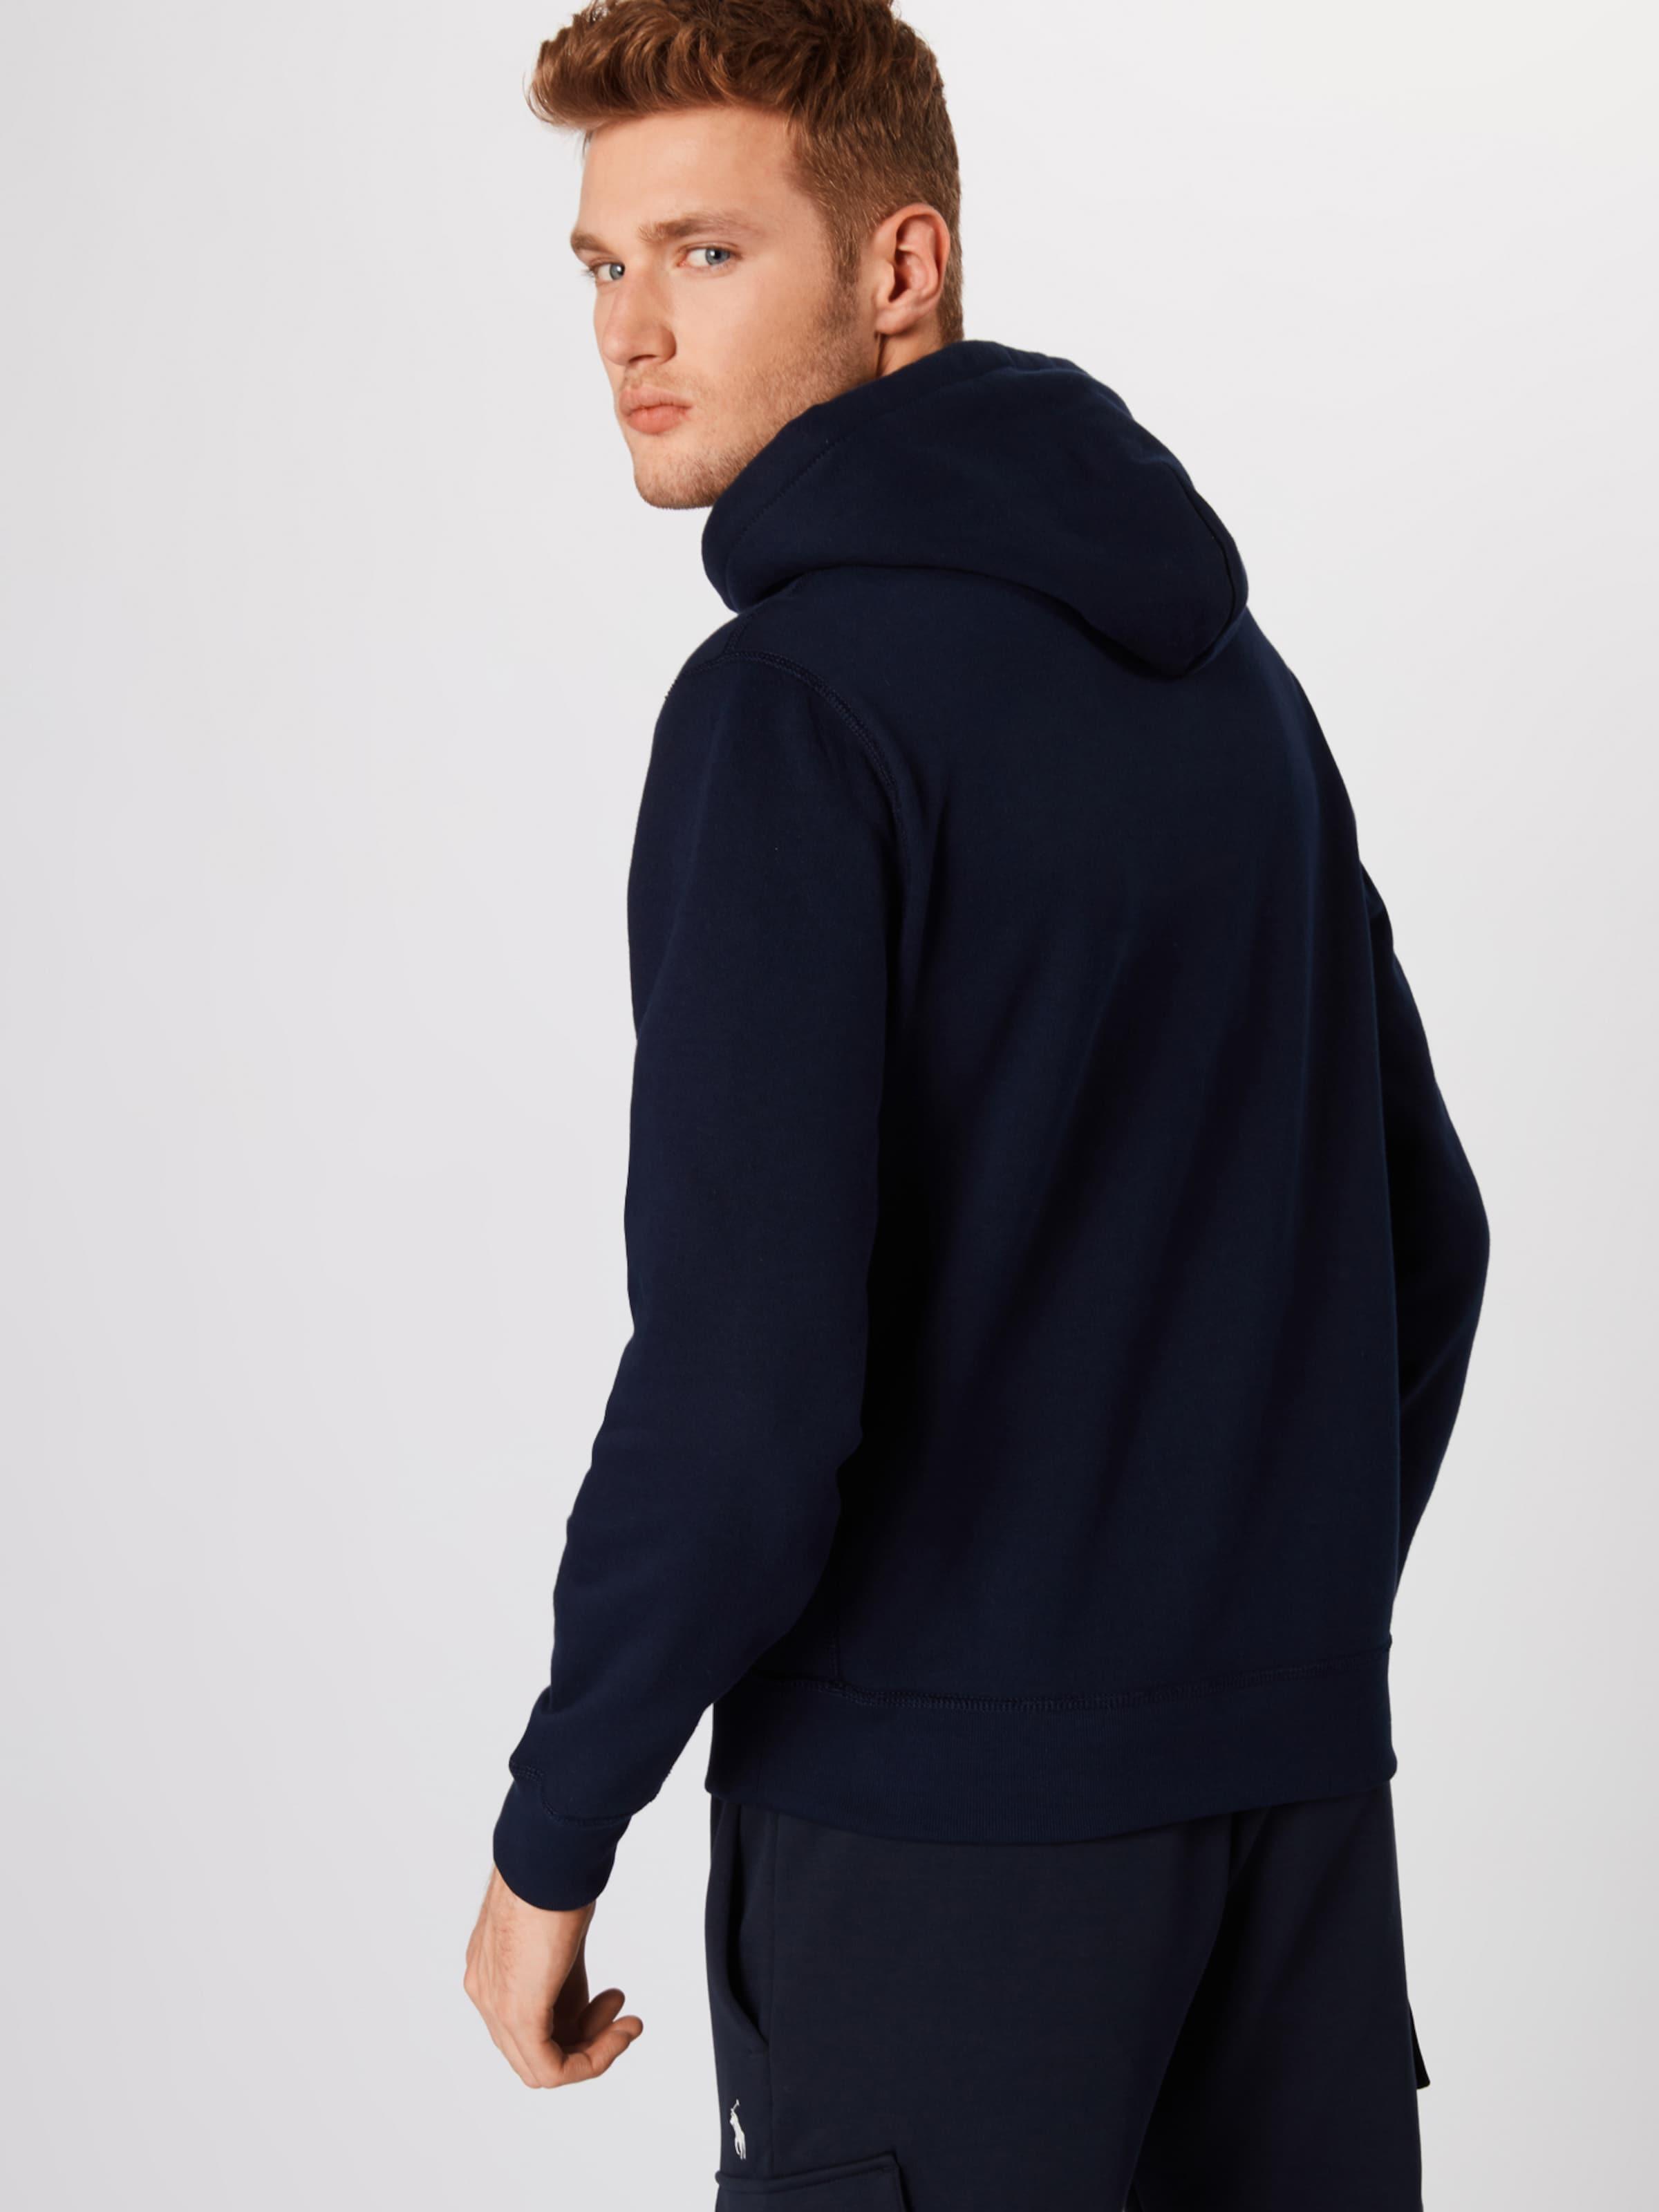 Polo Rouge Sweat shirt Ralph Lauren 'athletic' En zUqMVpS